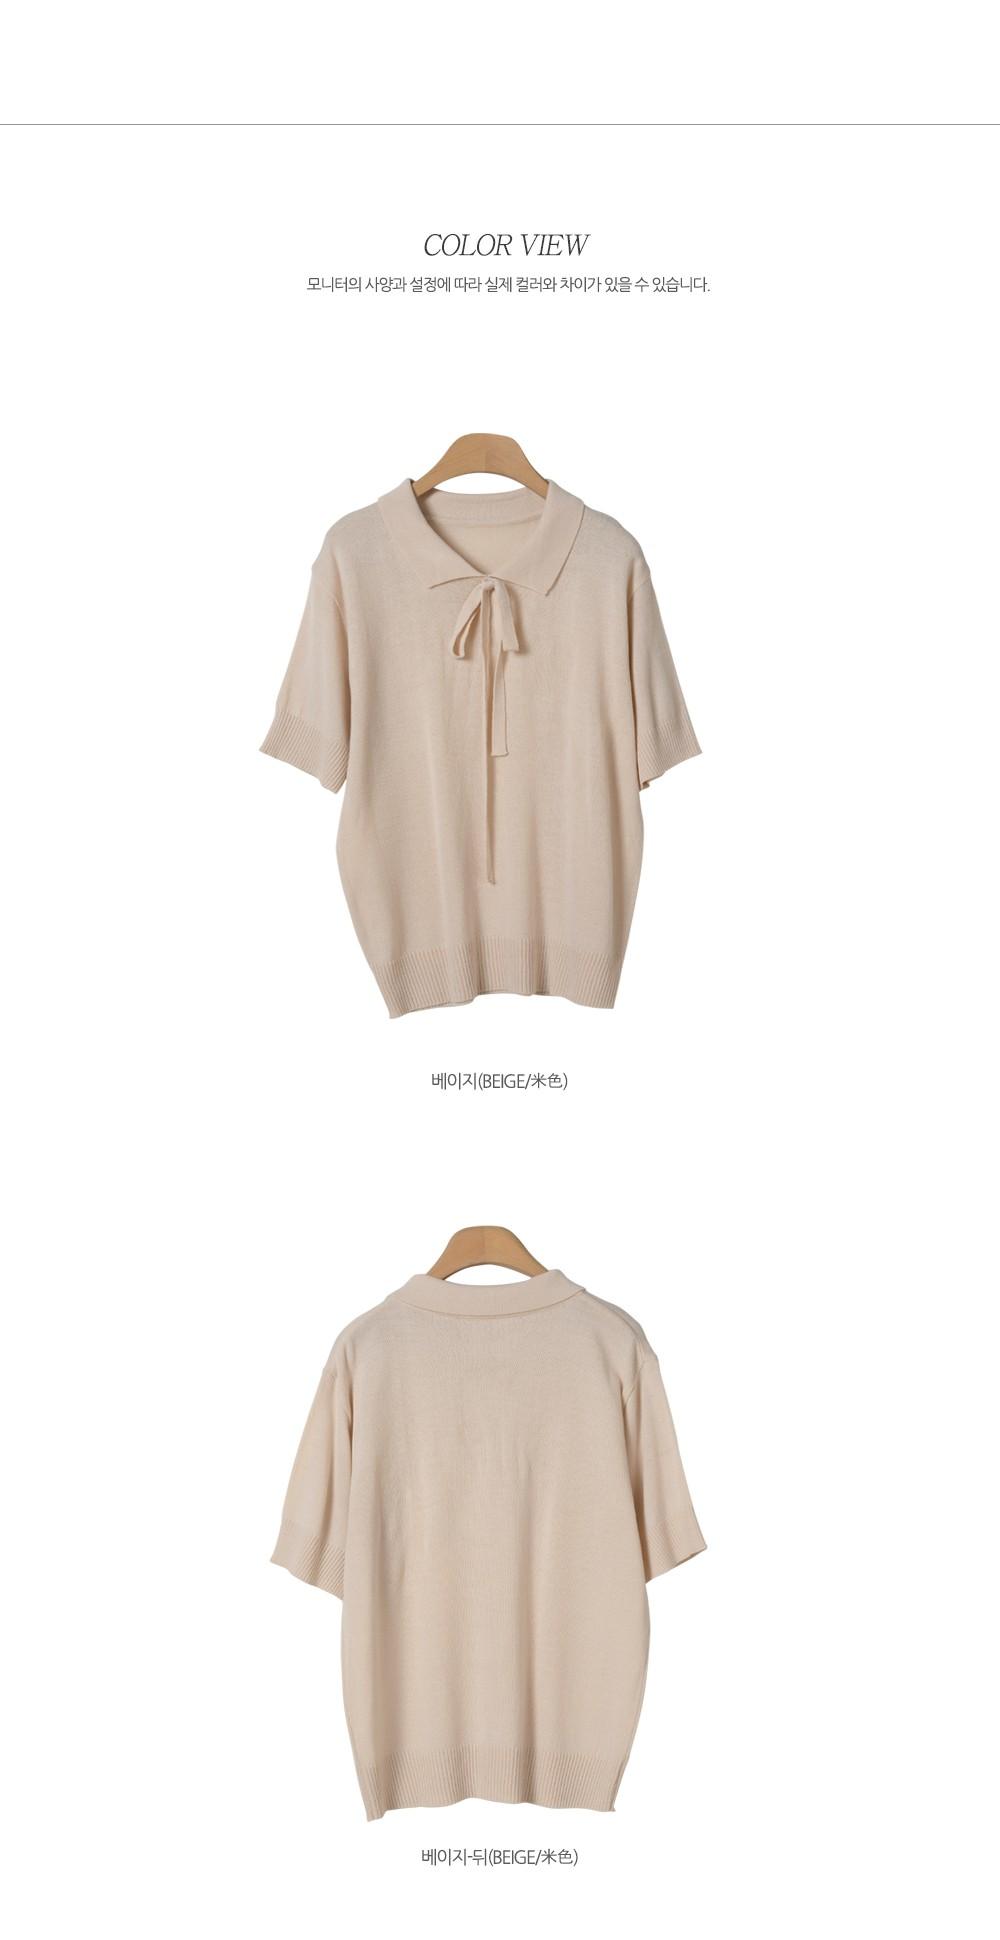 Type ribbon blouse knit tee